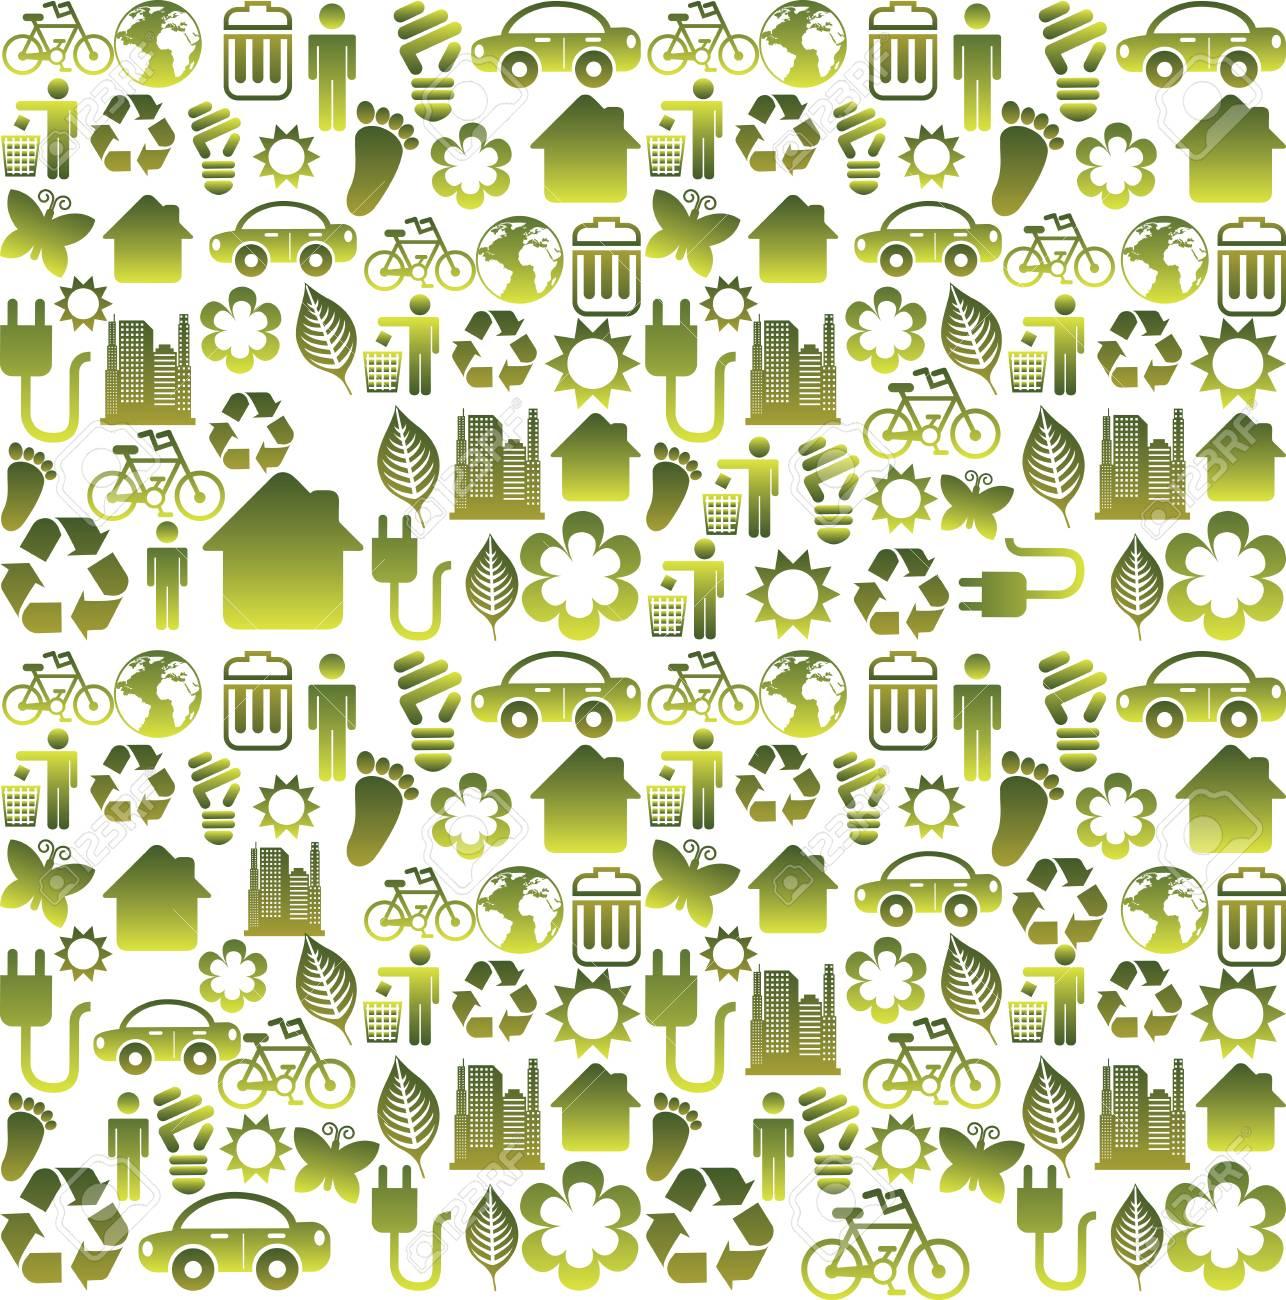 eco design over white background vector illustration Stock Vector - 24071139